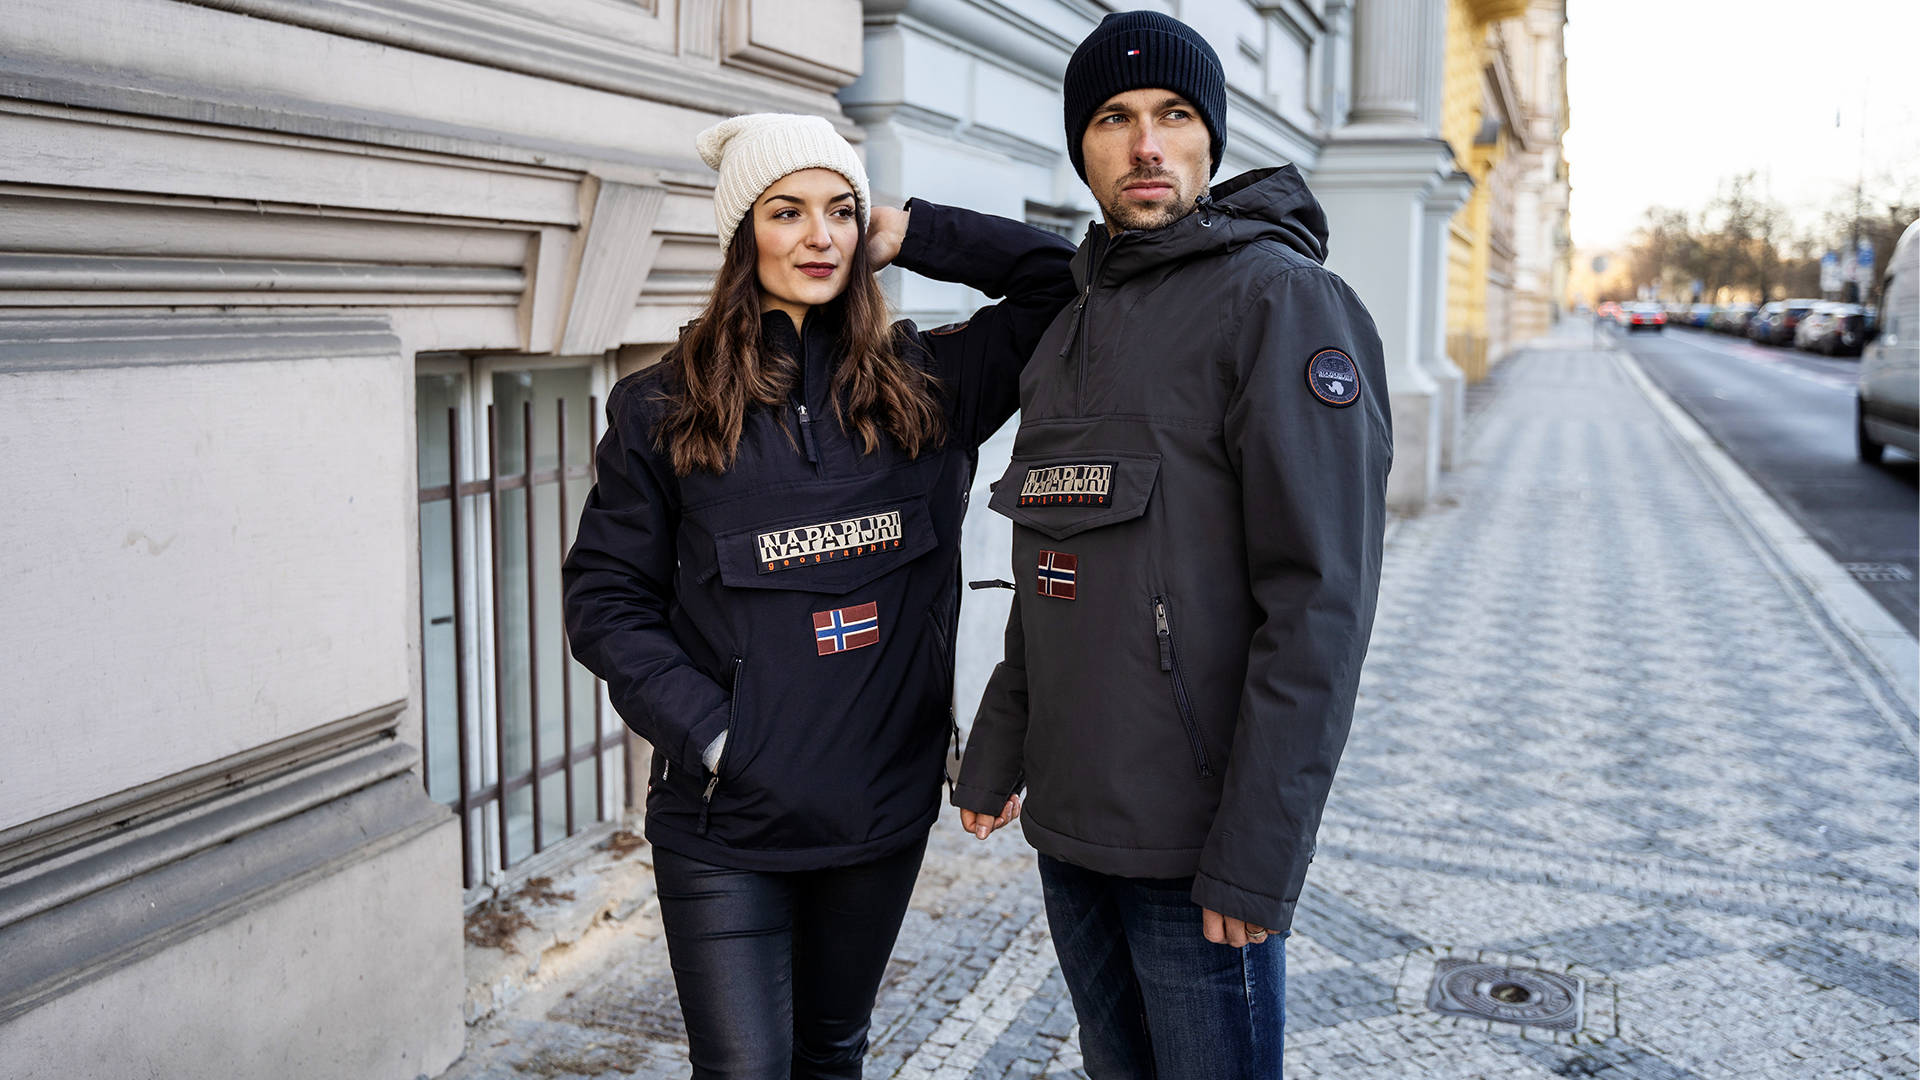 Telelj streetwear stílusban